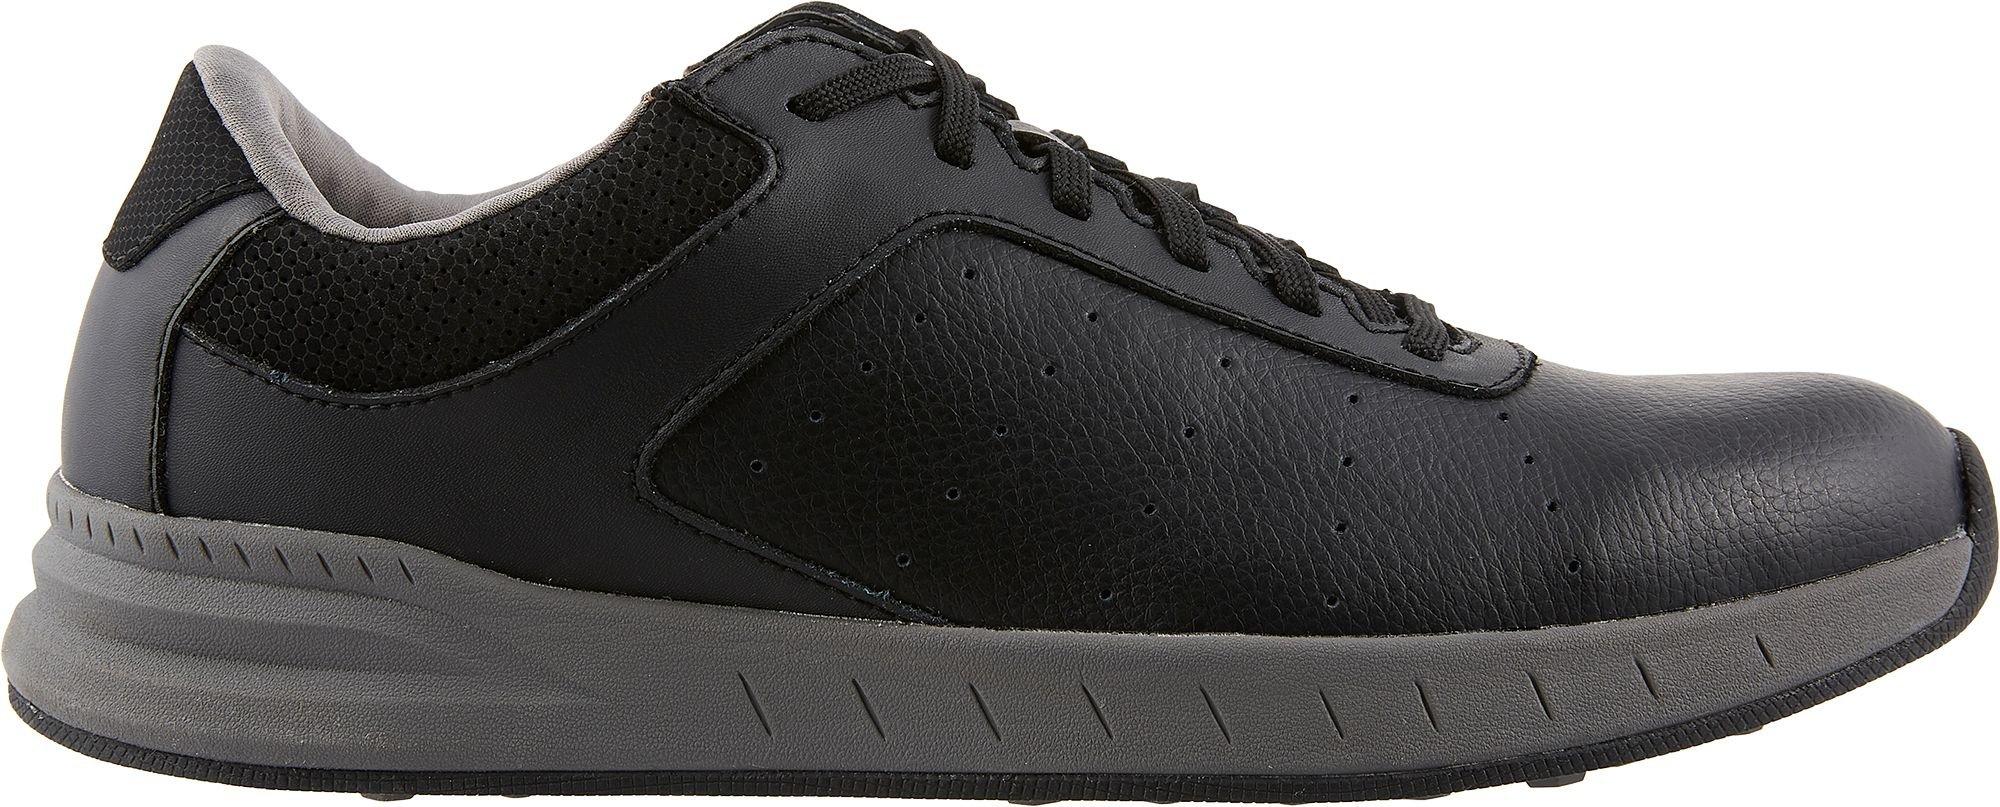 Walter Hagen Course Casual Golf Shoes (11-W, Black)